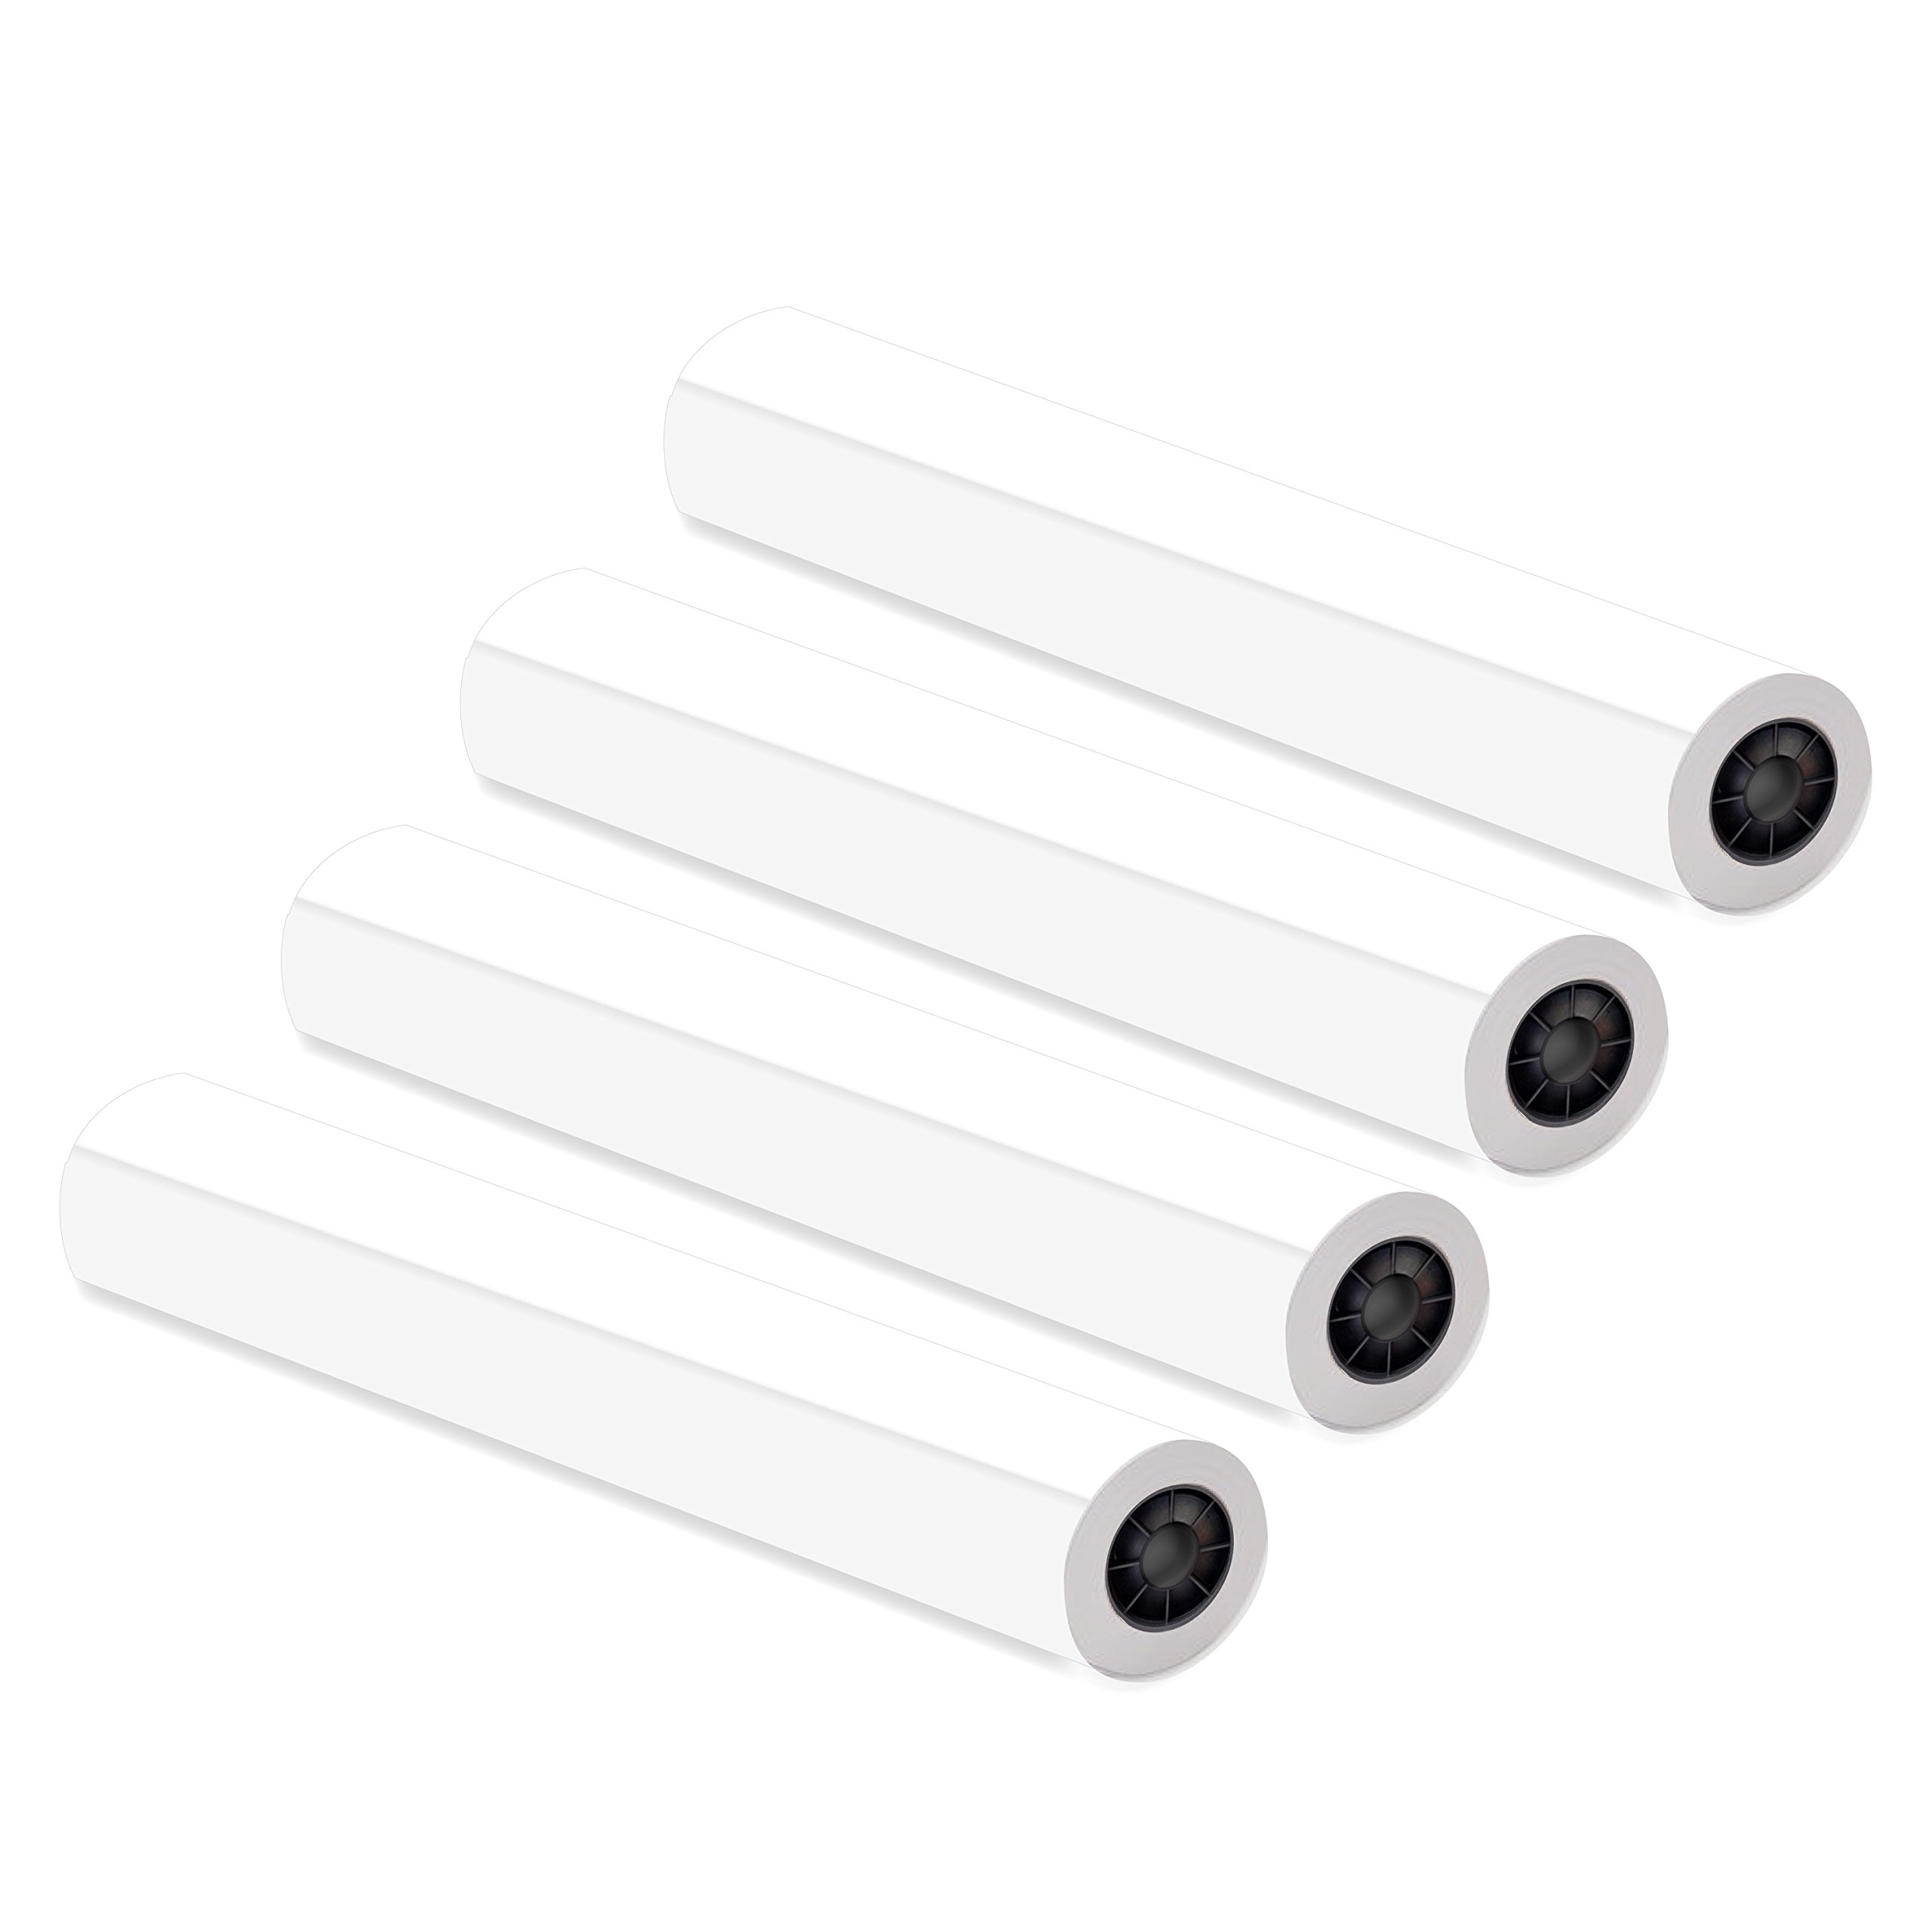 Alliance Untaped CAD Paper Rolls, 36'' x 150', 20 lb, 92 Bright, Ink Jet Bond, Engineering Rolls - 4 Rolls, 2'' Core